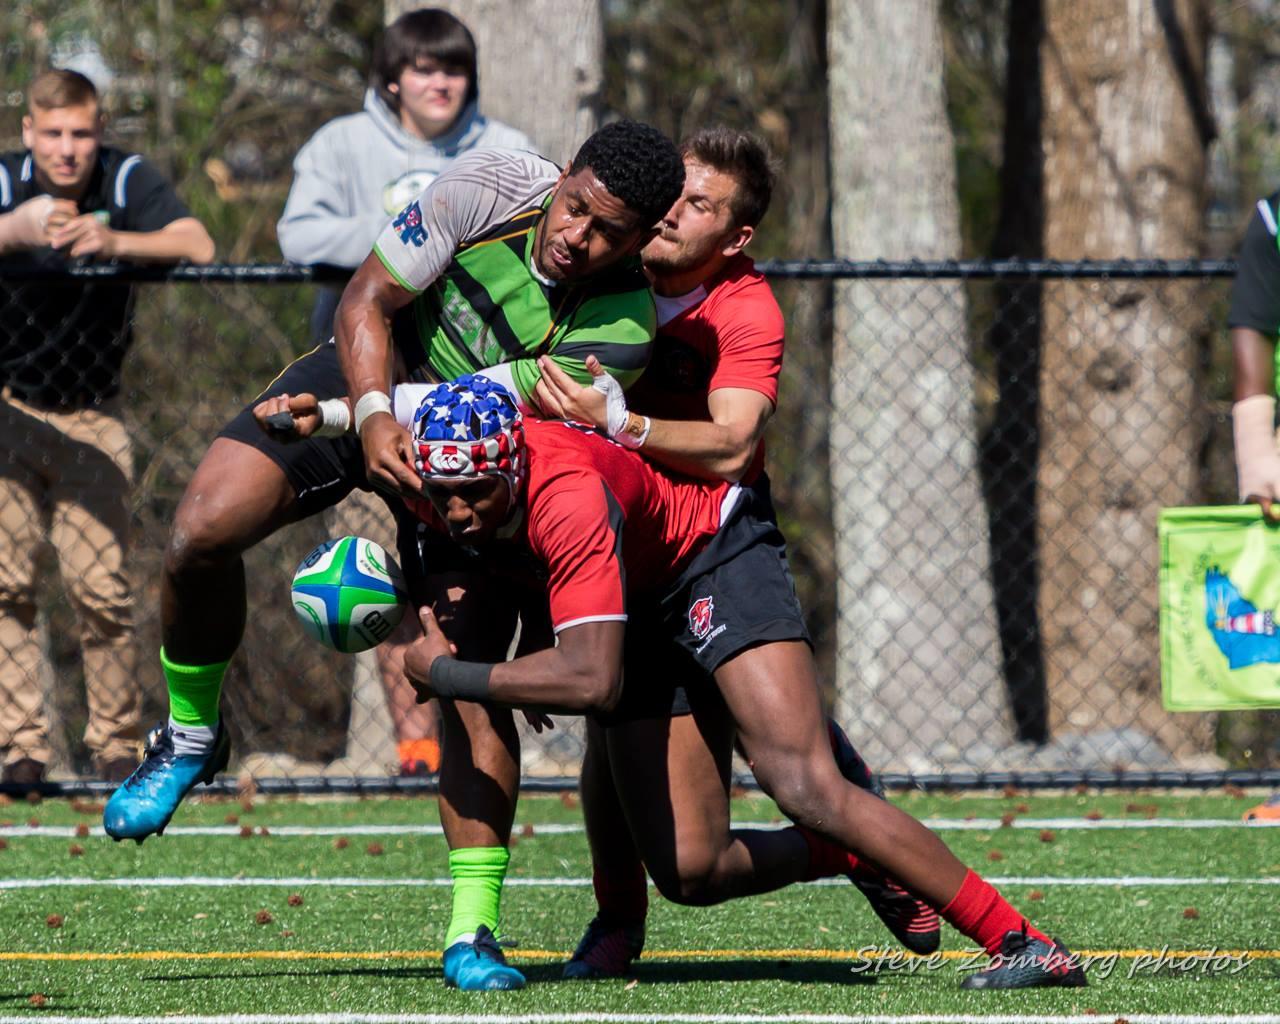 Life University rugby v Davenport March 4, 2017. Steve Zomberg photo.